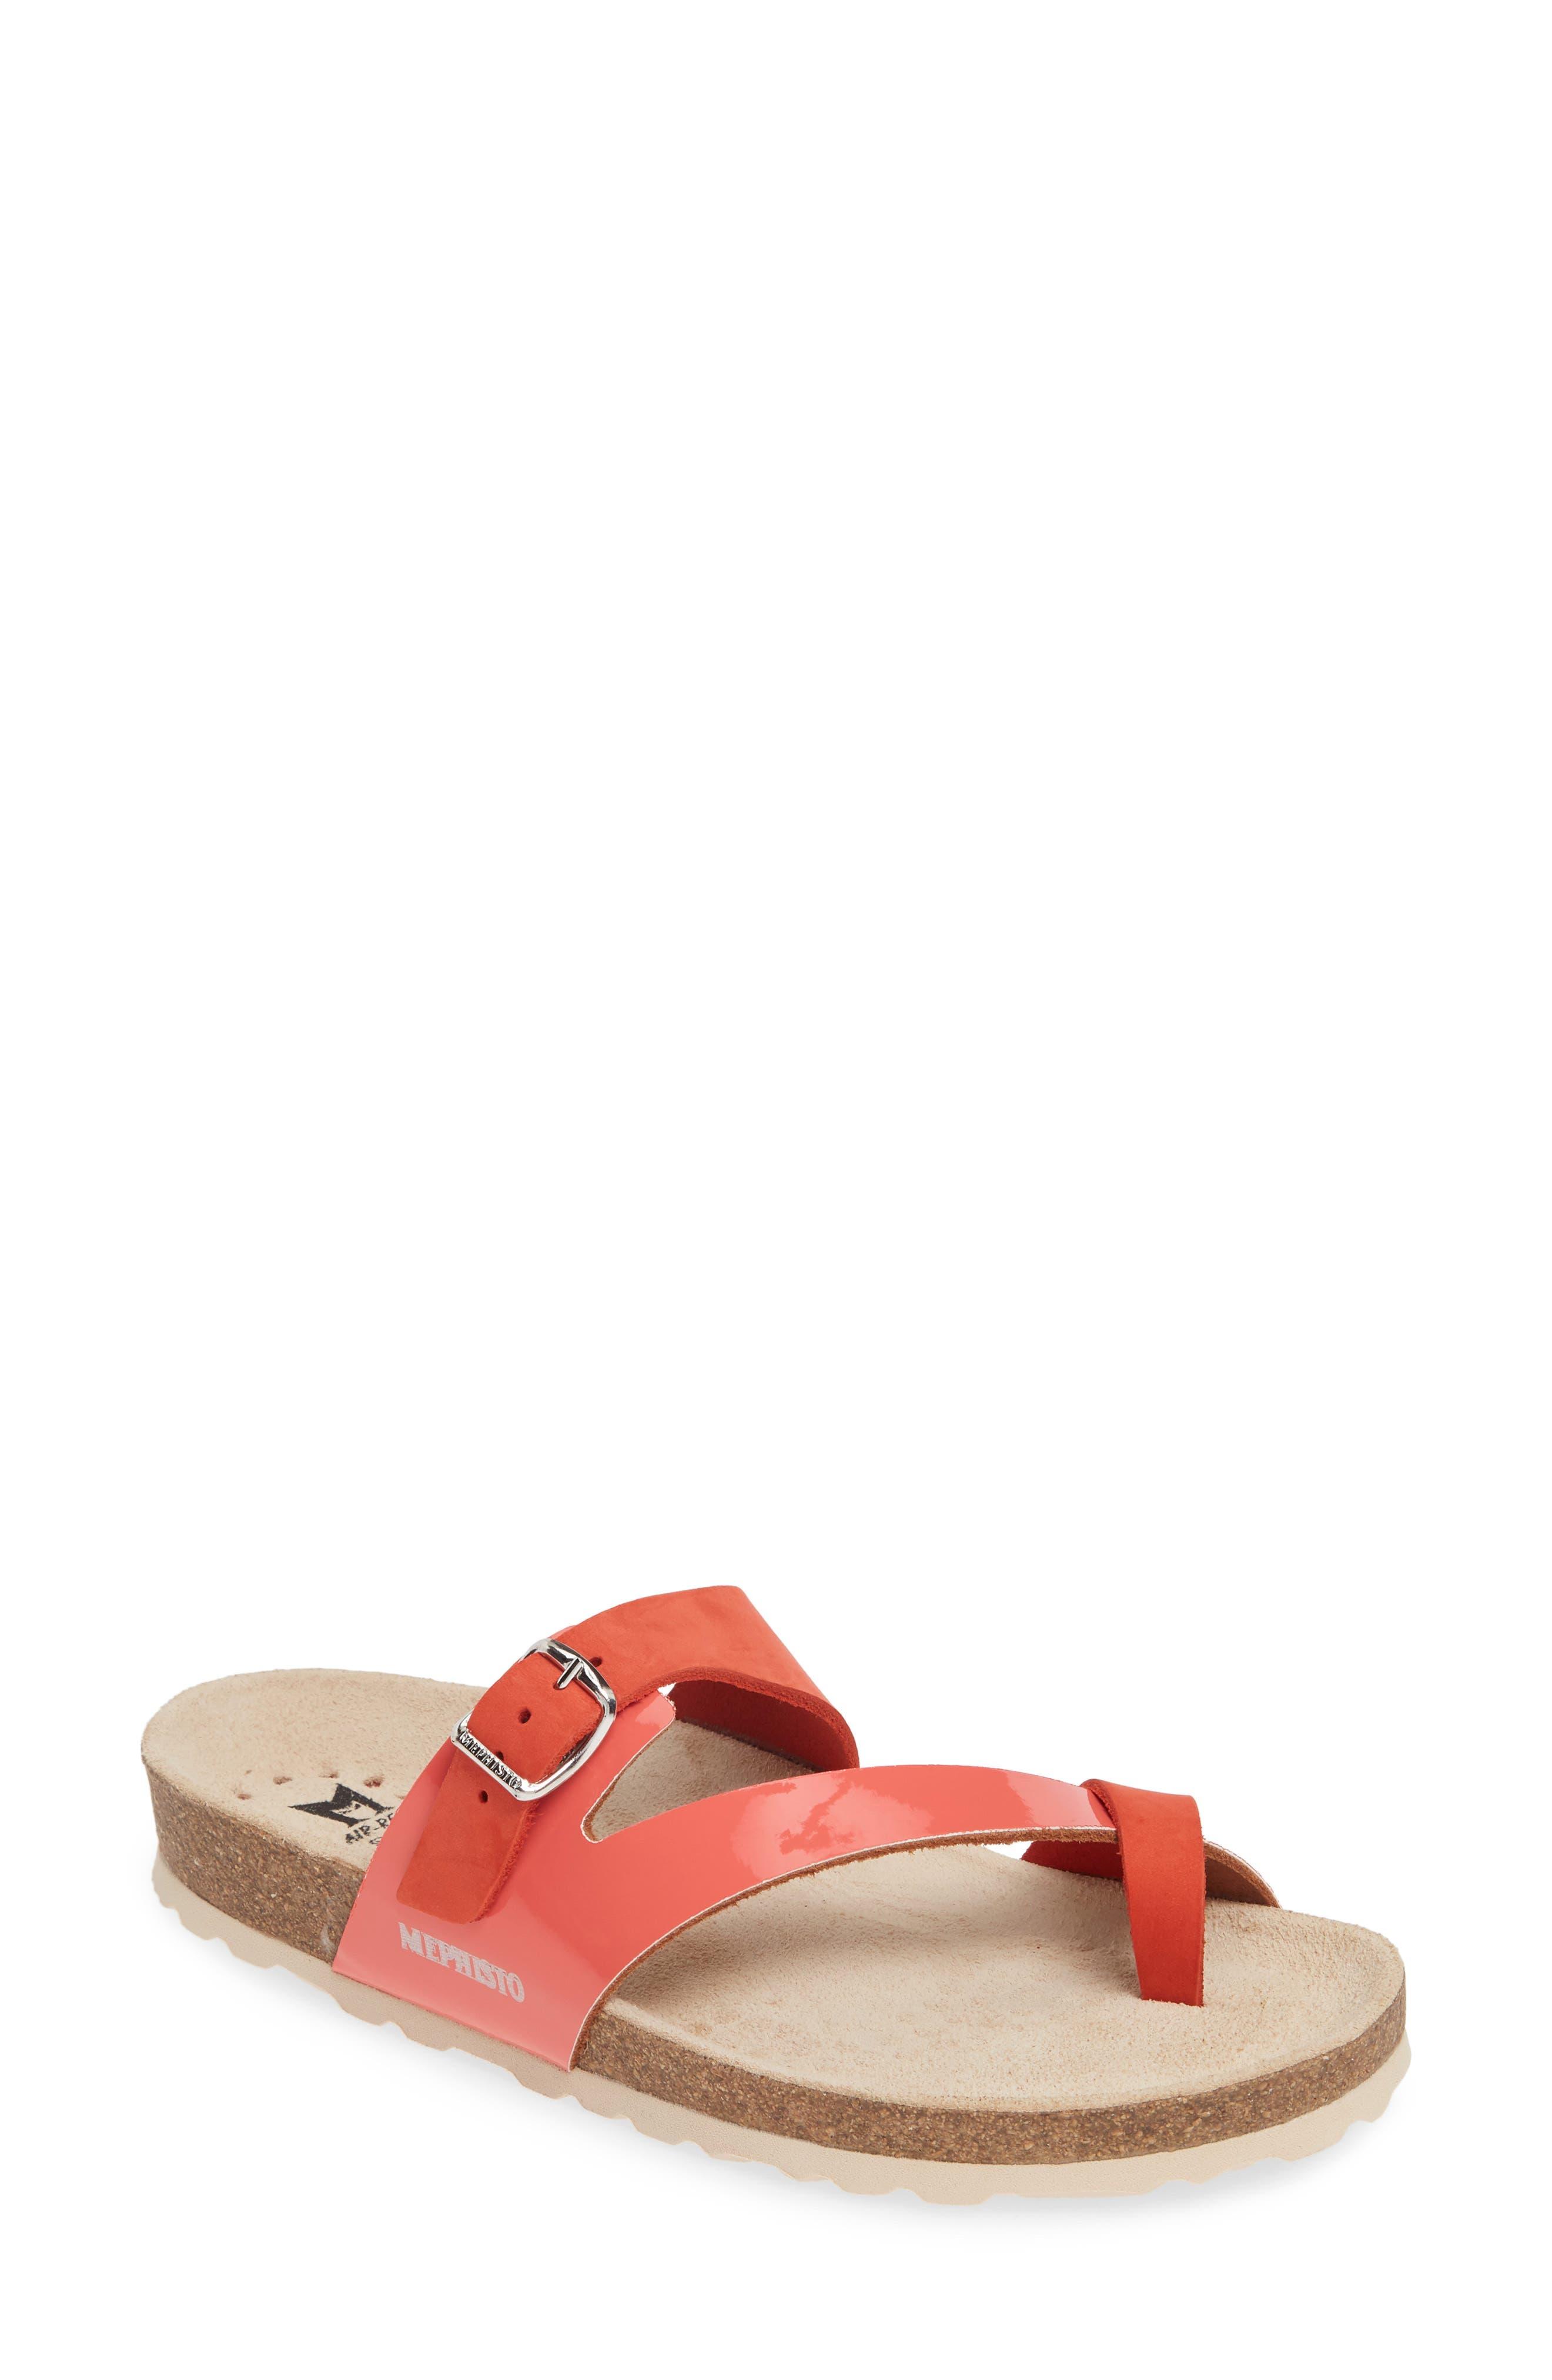 Mephisto Nalia Slide Sandal, Orange